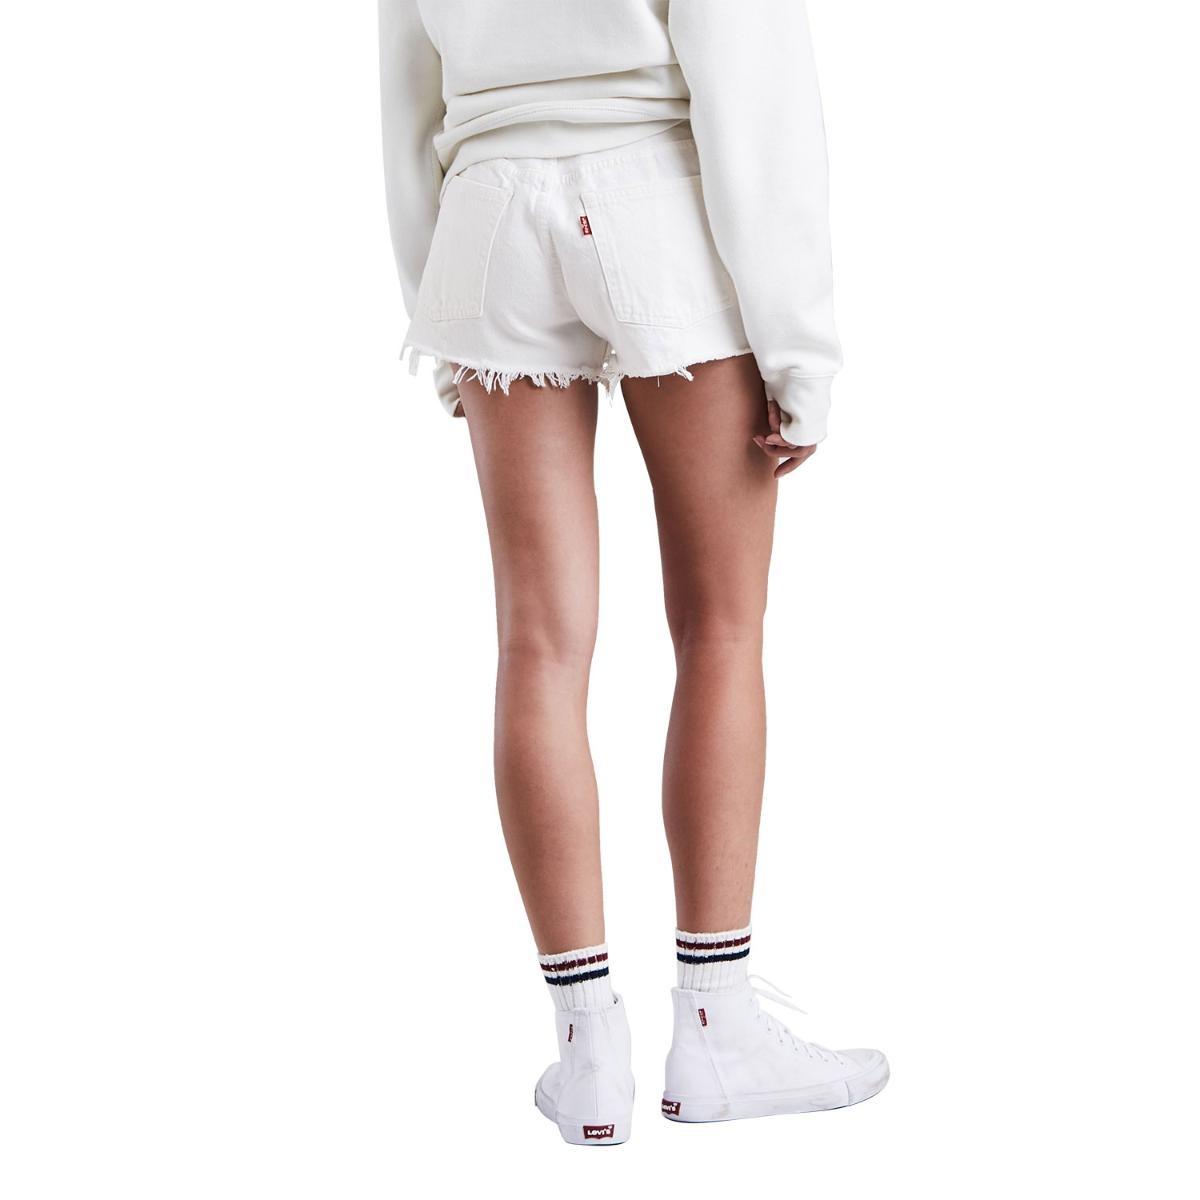 shorts jeans levis 501 altered zip branco. Carregando zoom. df826ddd8f8